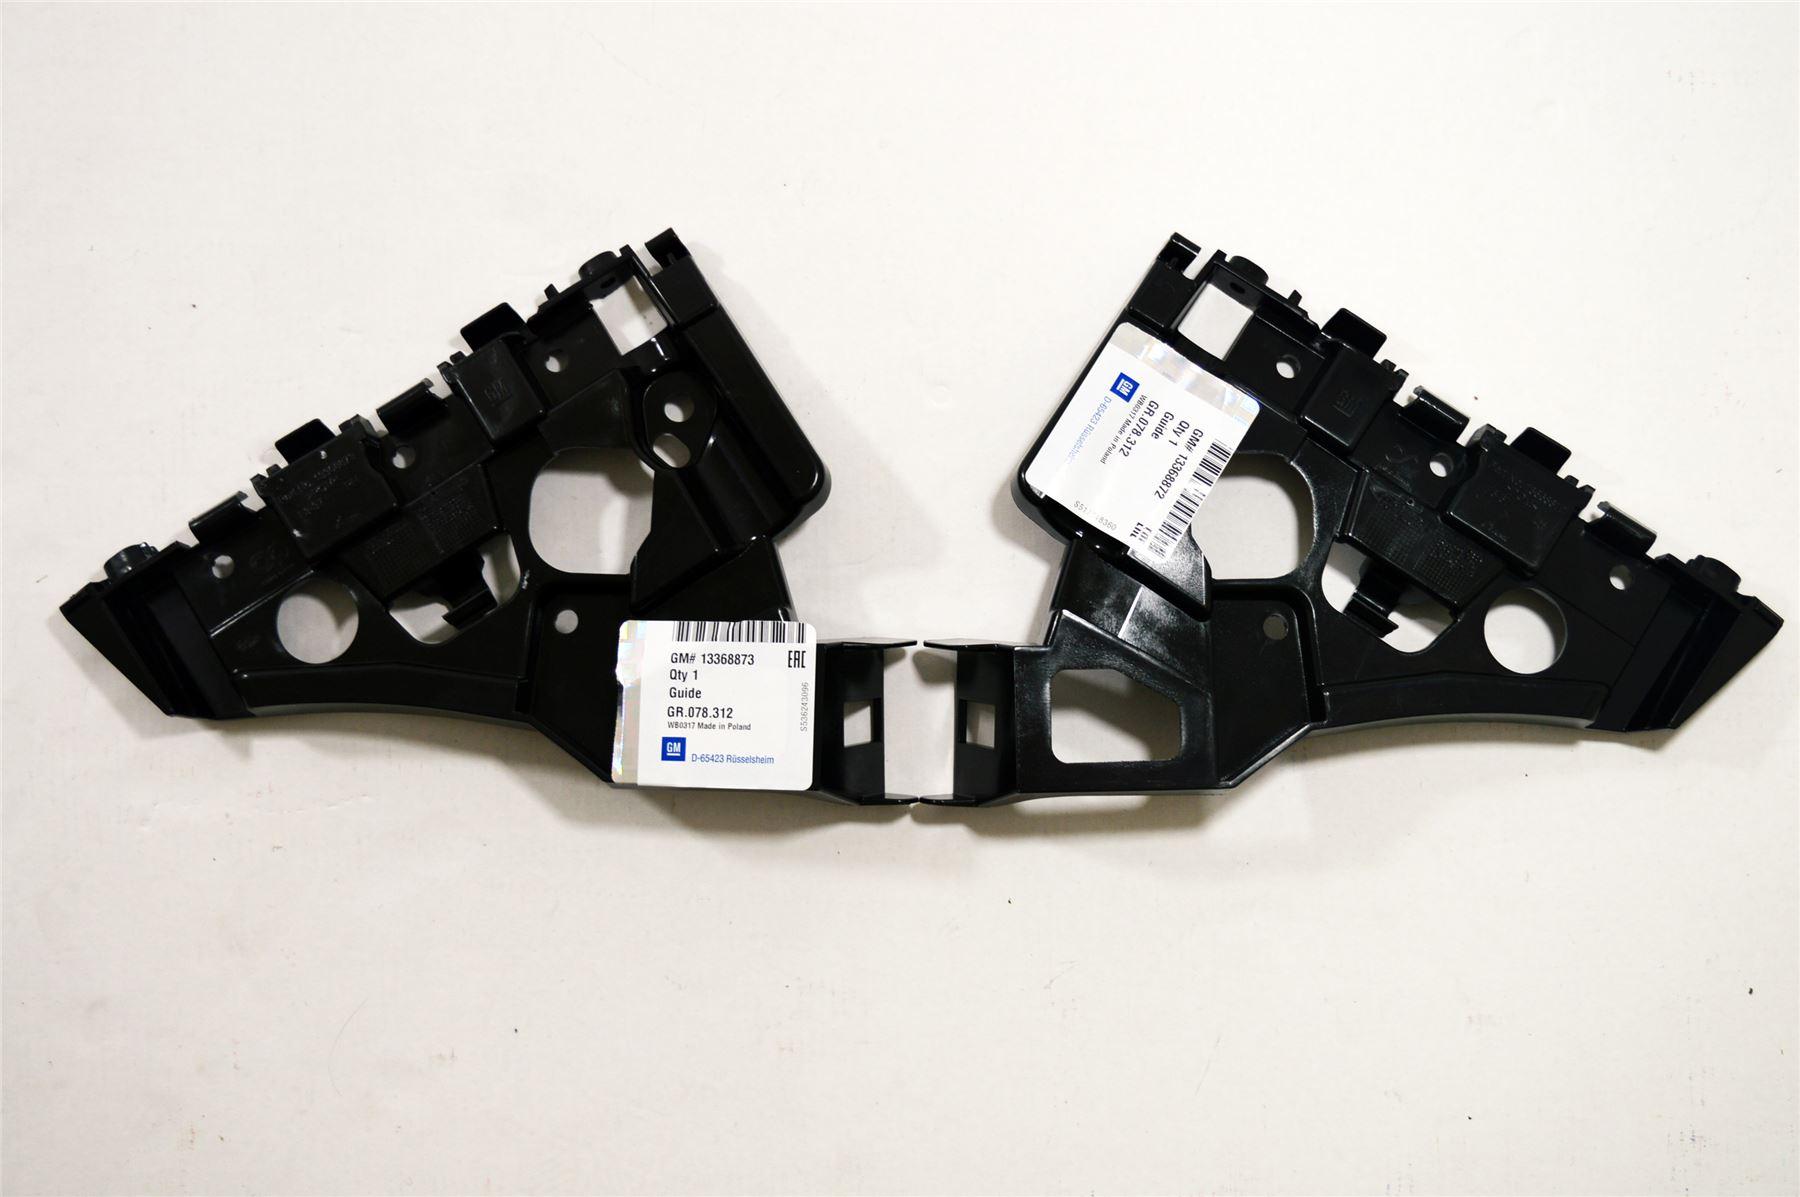 BRACKETS *NEW* VAUXHALL ASTRA J 13-16 LH /& RH FRONT BUMPER RETAINING GUIDES